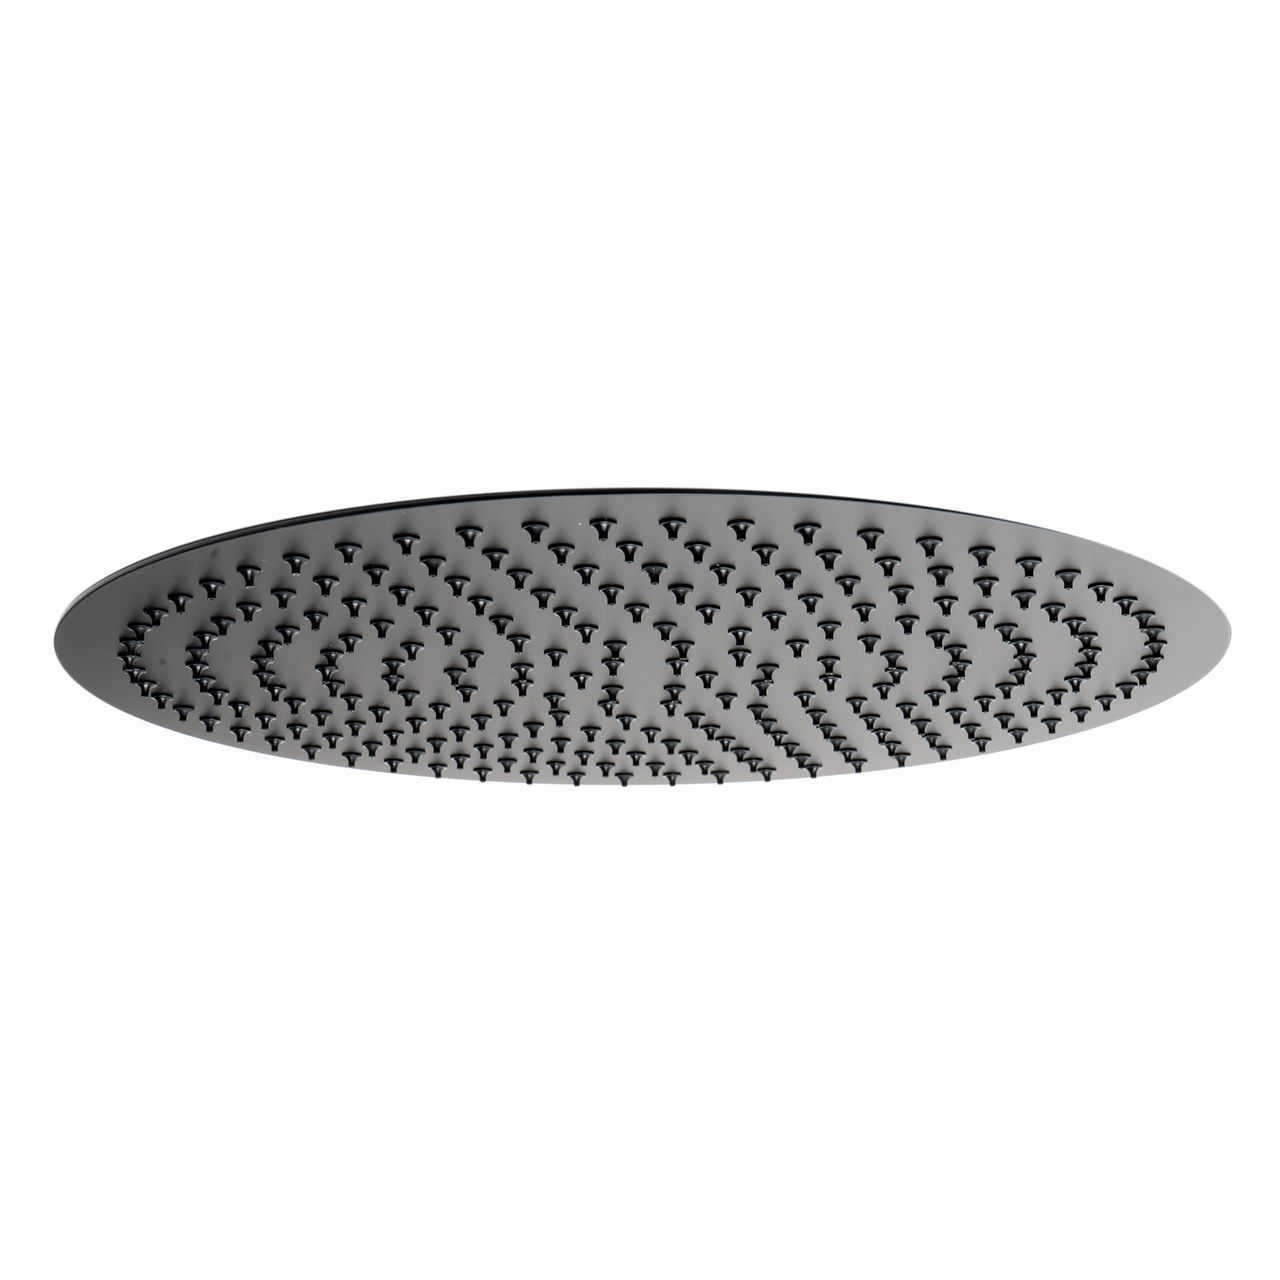 "ALFI 16"" Round Black Matte Stainless Steel Ultra-Thin Shower Head"